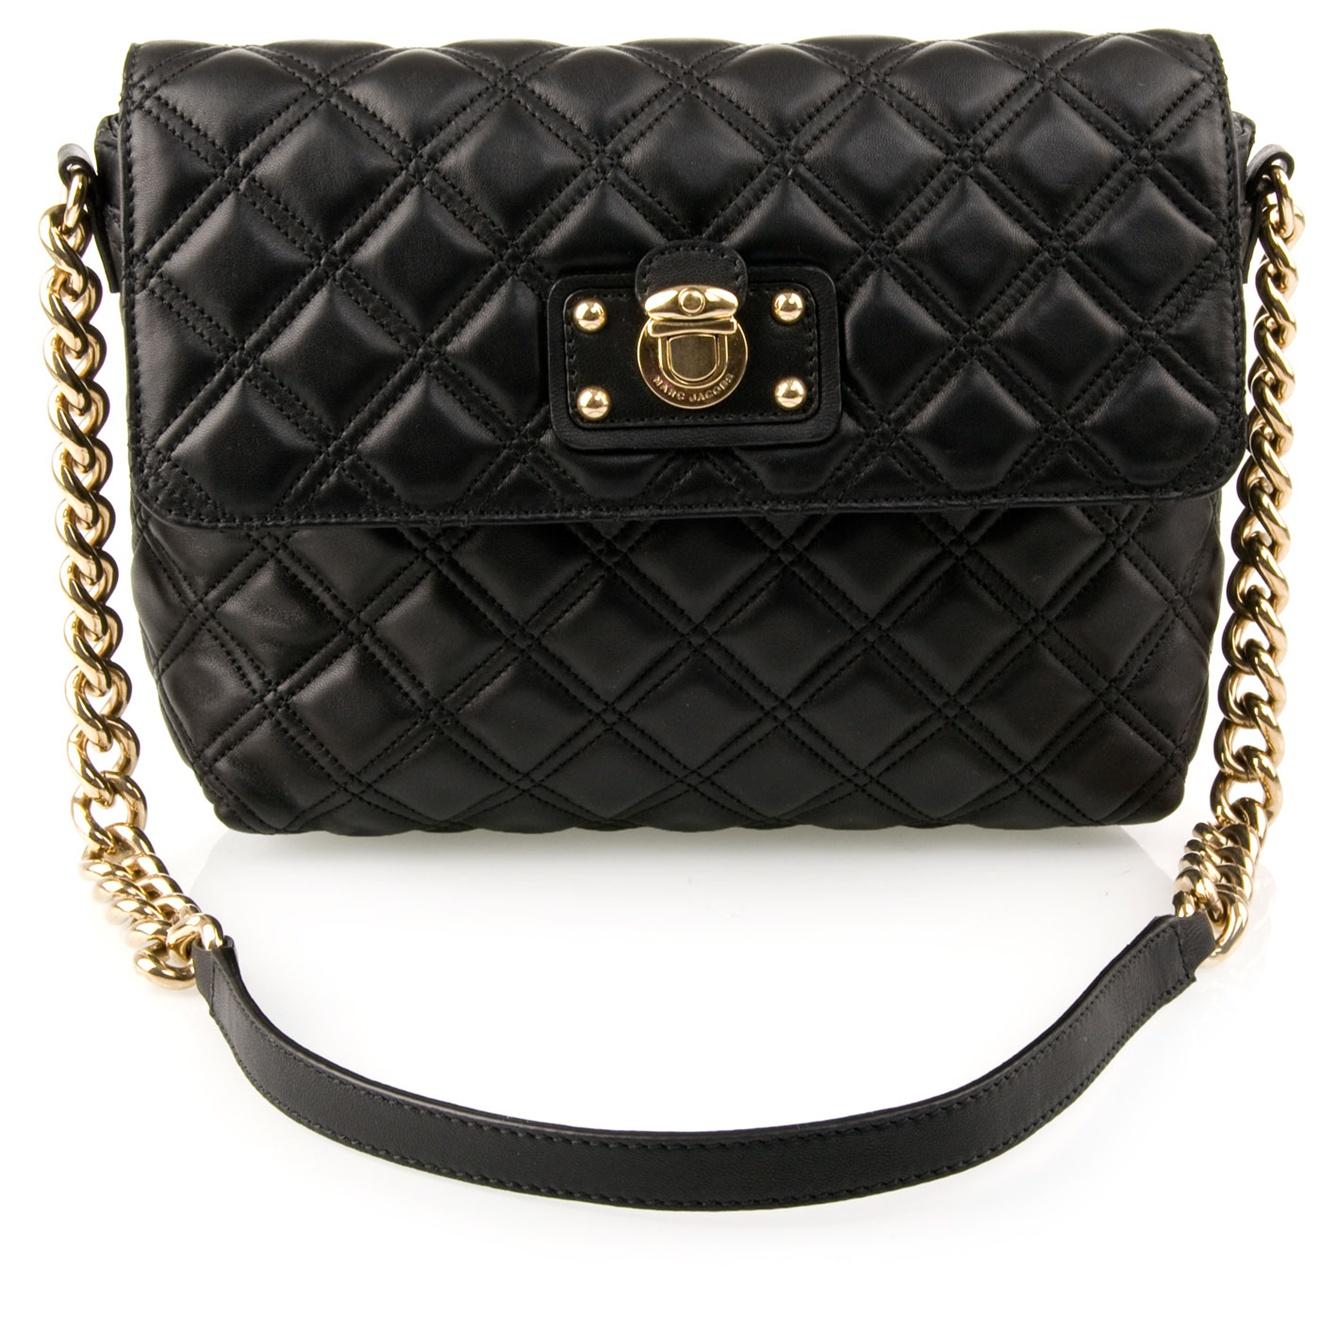 cf5ddaa660609 Marc Jacobs Quilted Bag Black - Bag Photos and Wallpaper HD